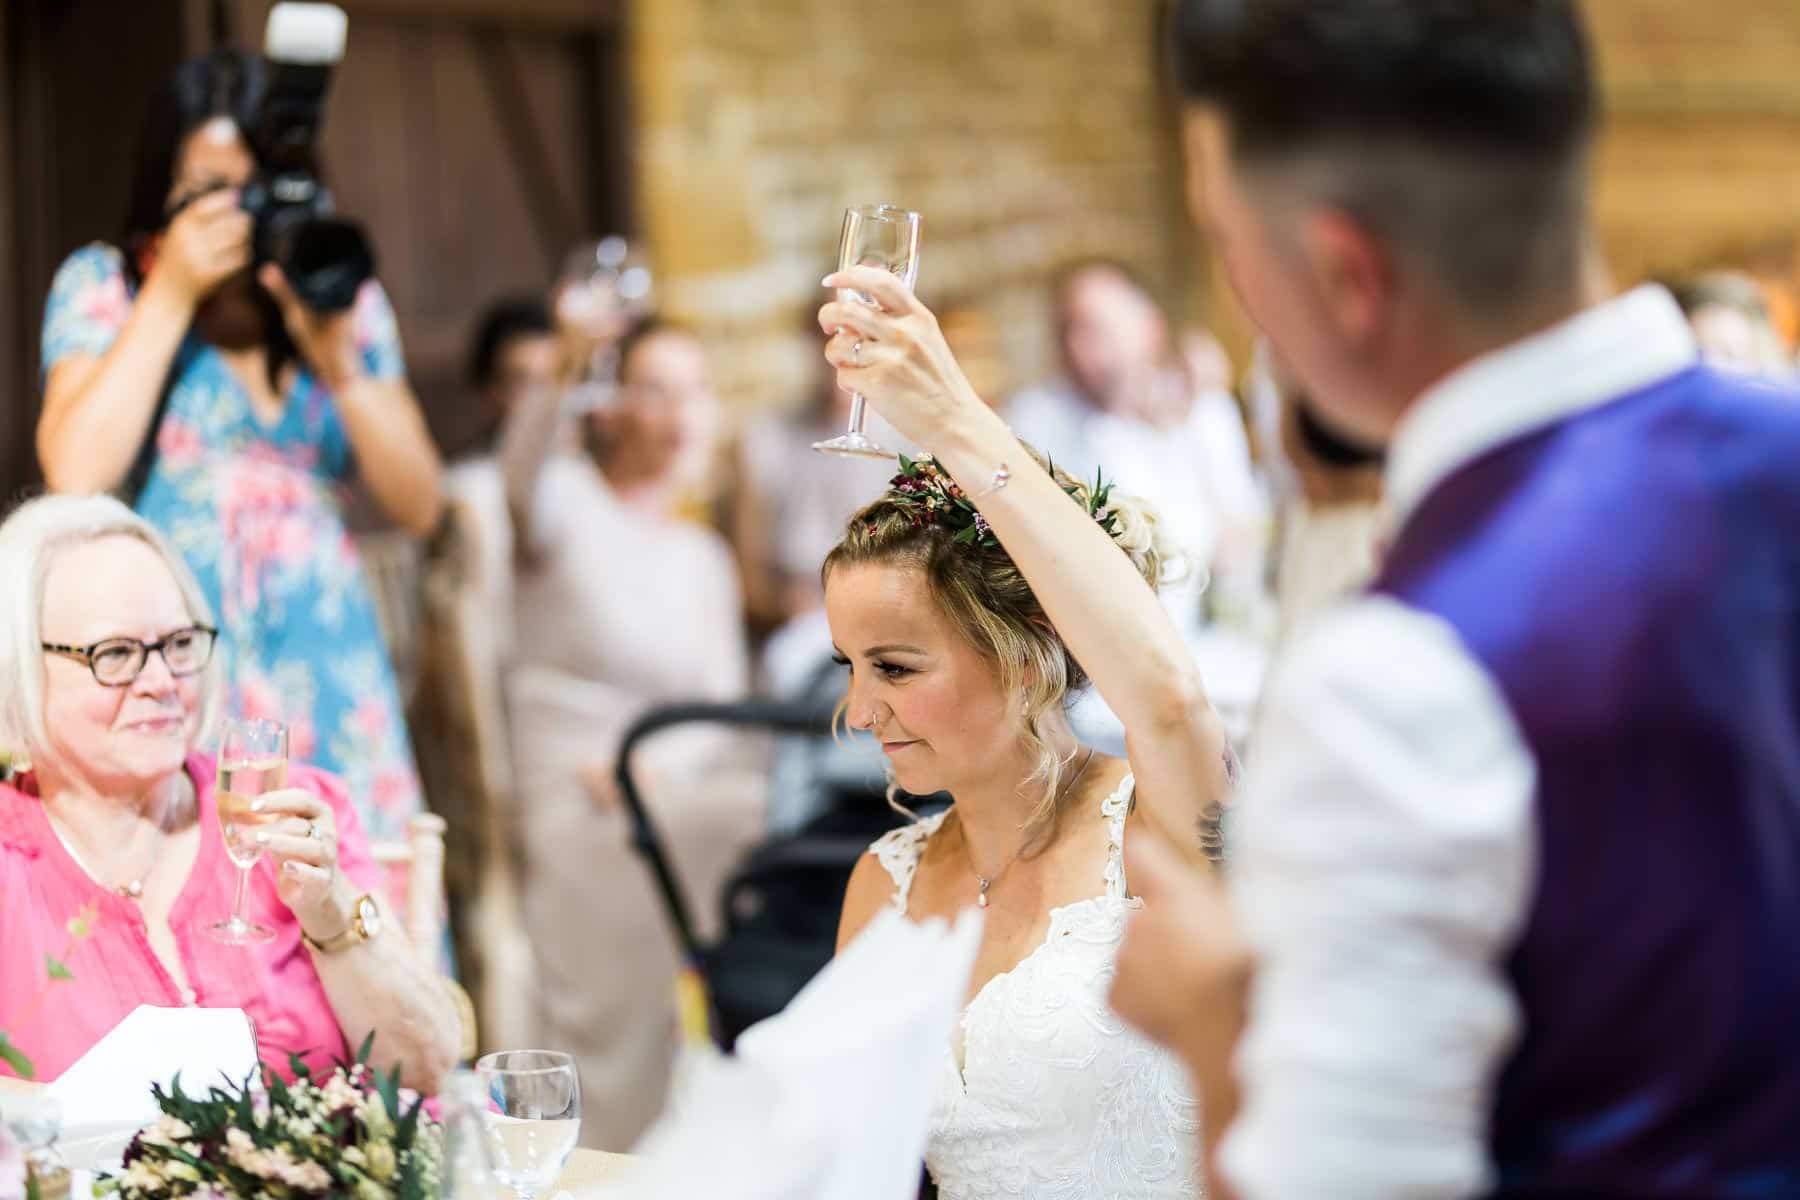 Bride cheers to her groom